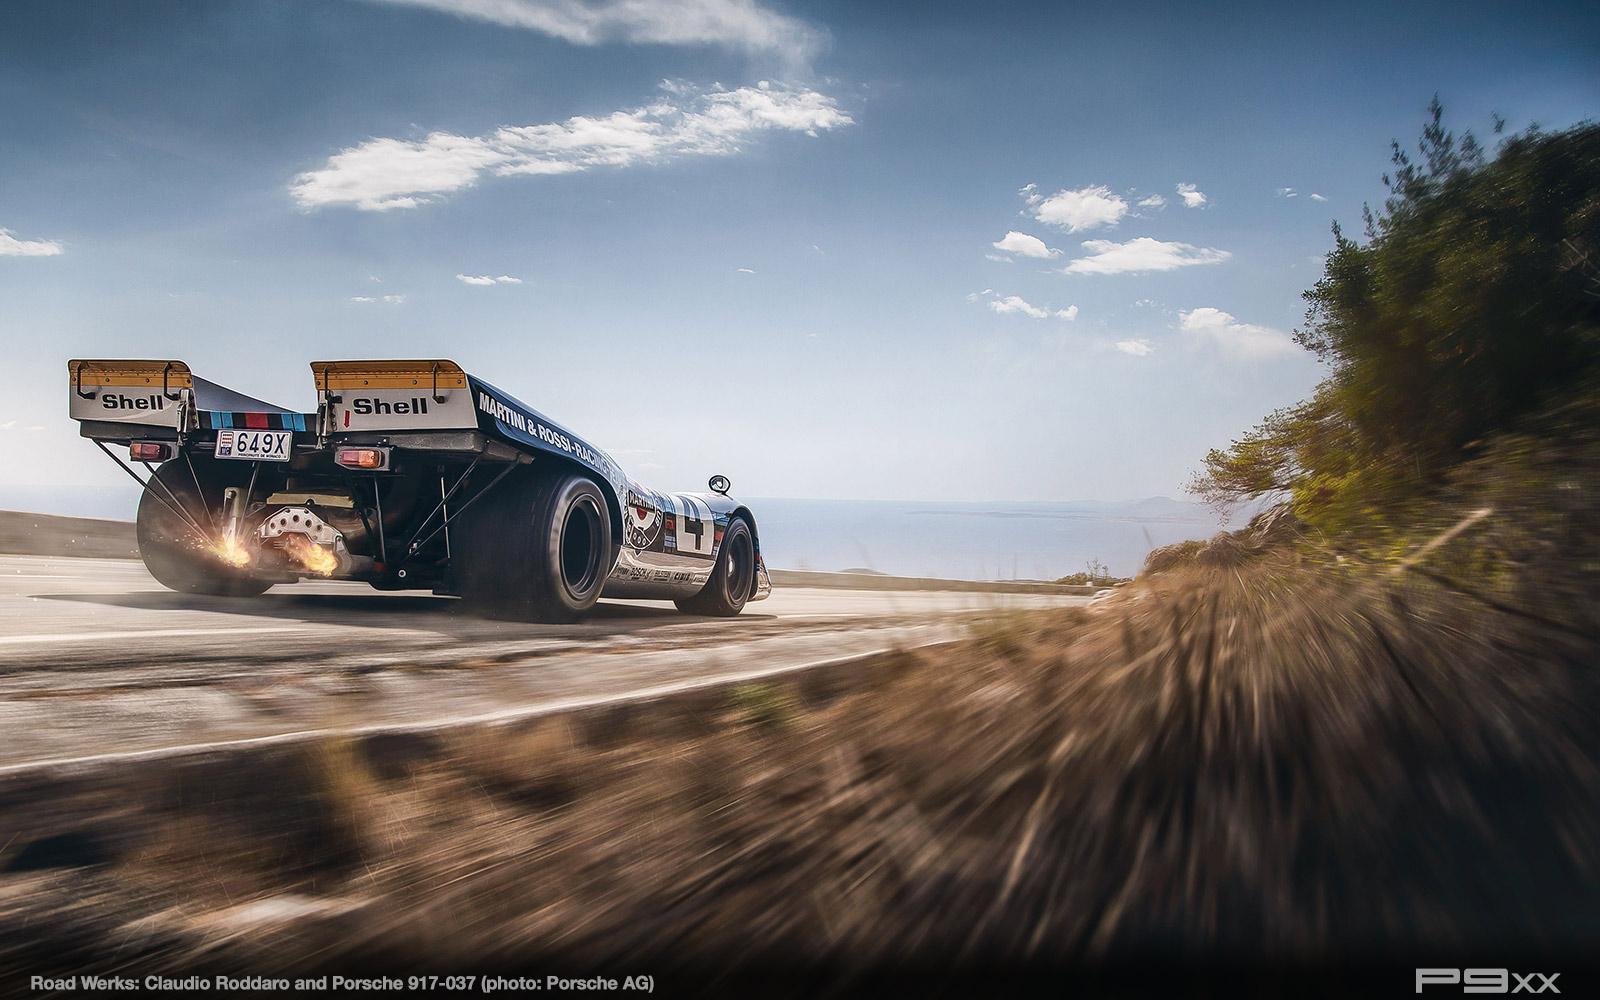 Porsche-917-037-Martini-Racing-Monaco-2018-310